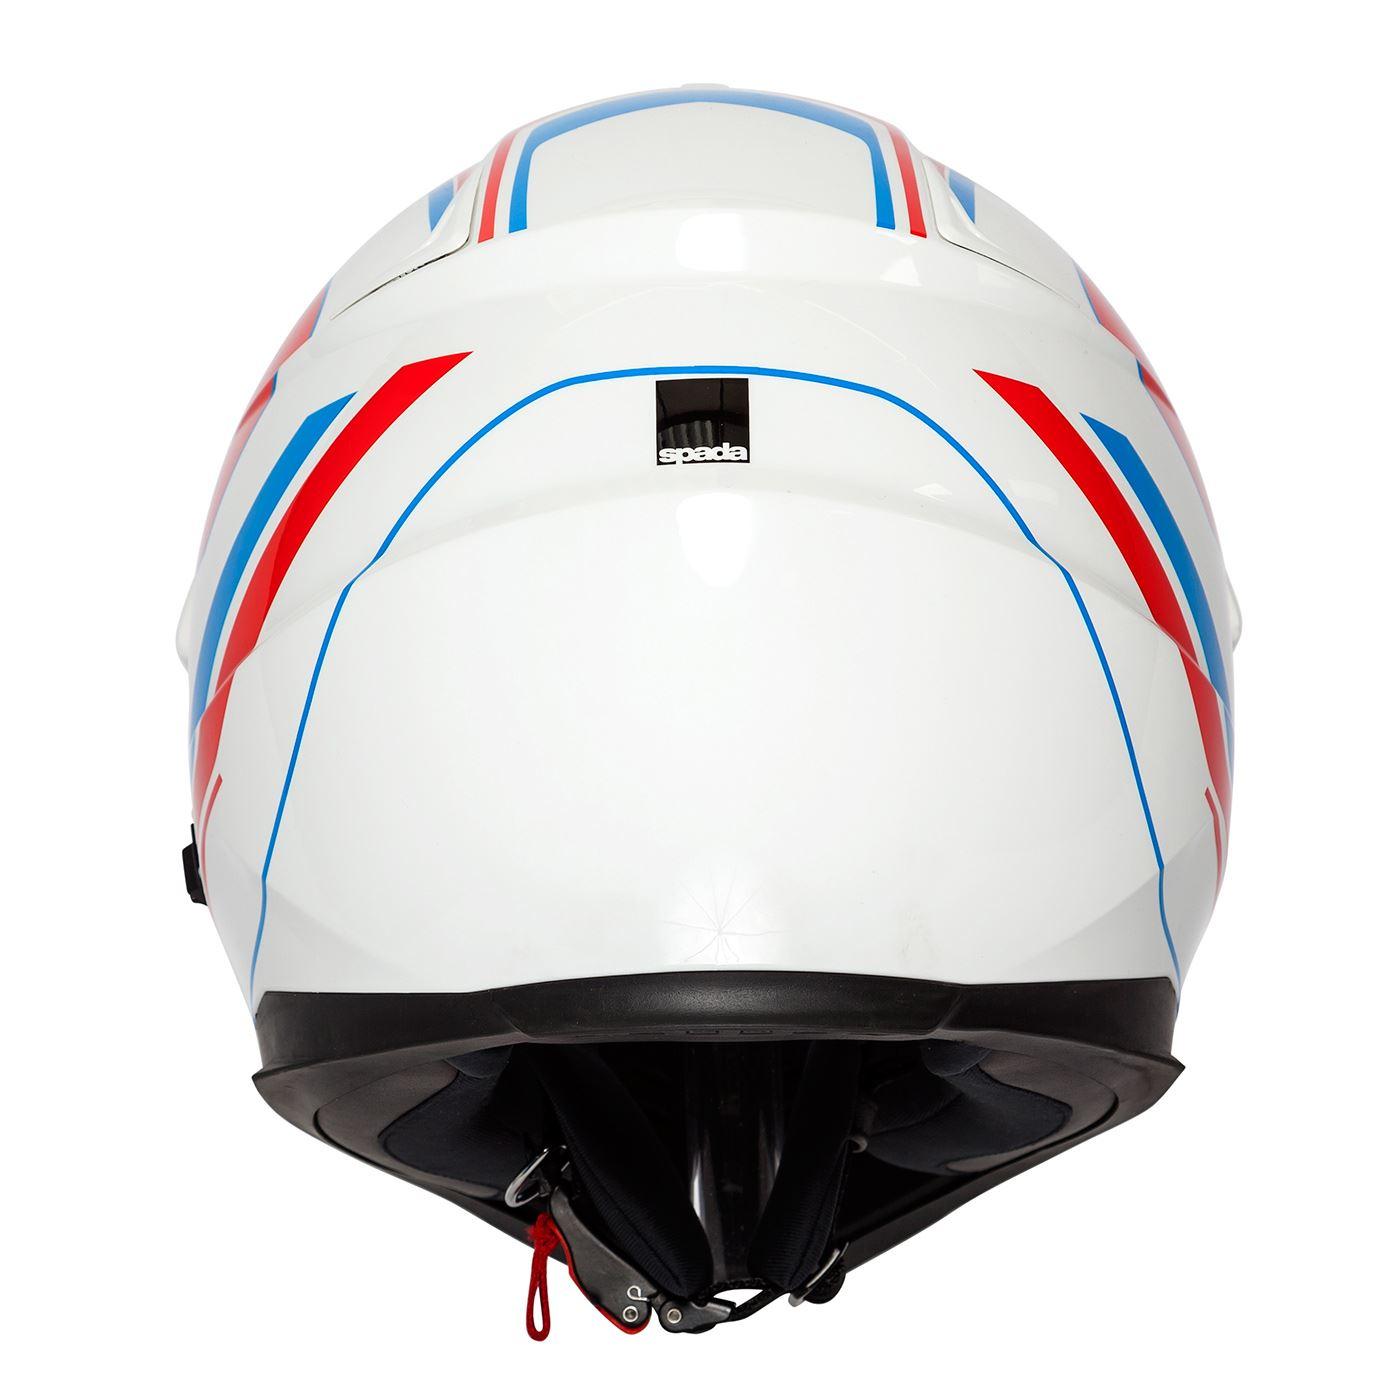 Spada-Intrepid-Full-Face-Motorcycle-Off-Road-Adventure-Style-Helmet-Sun-Visor thumbnail 27